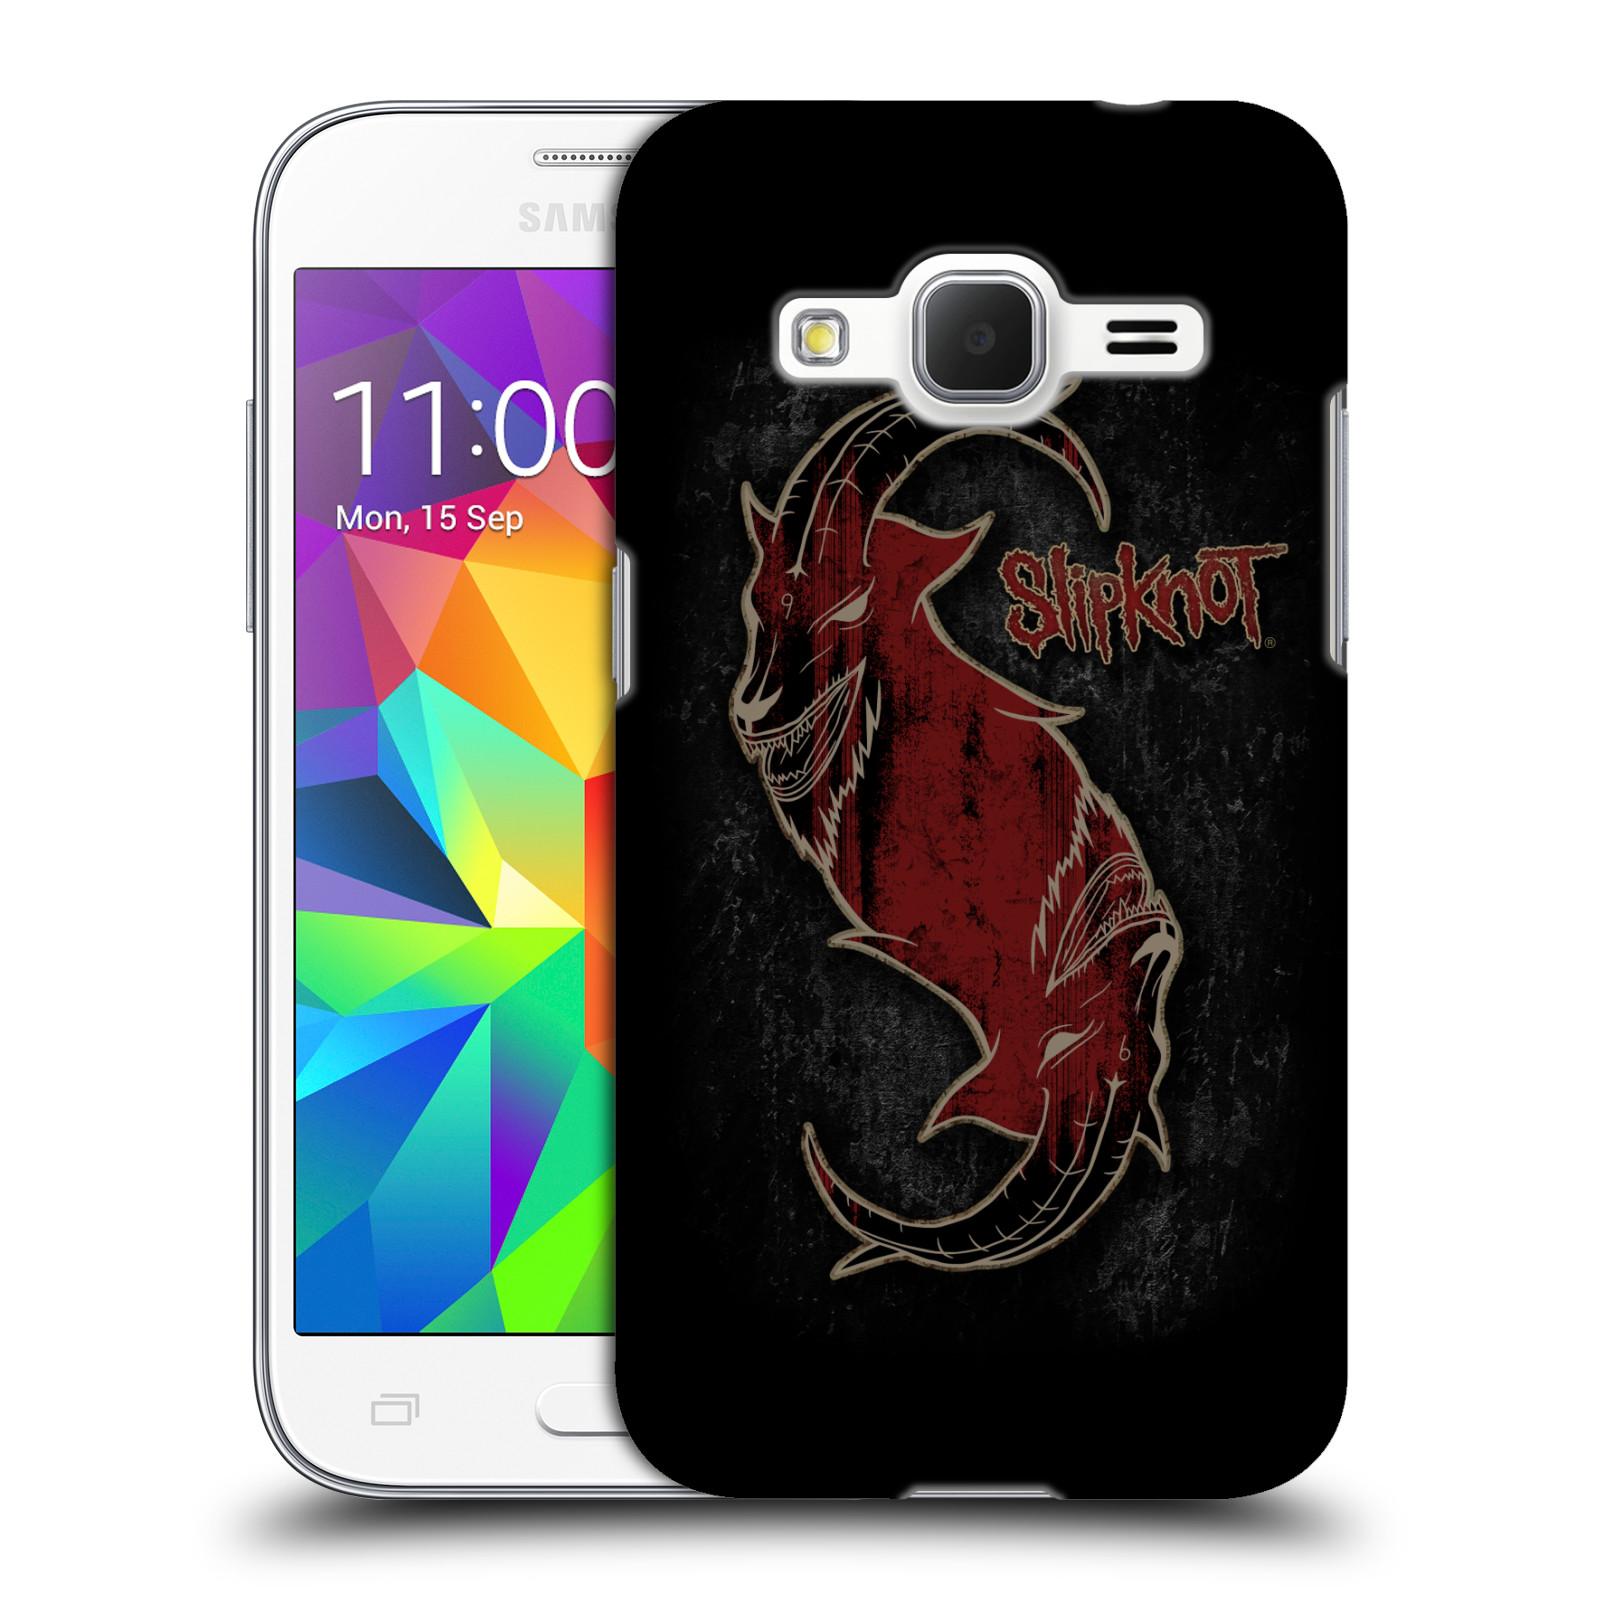 Plastové pouzdro na mobil Samsung Galaxy Core Prime VE HEAD CASE Slipknot - Rudý kozel